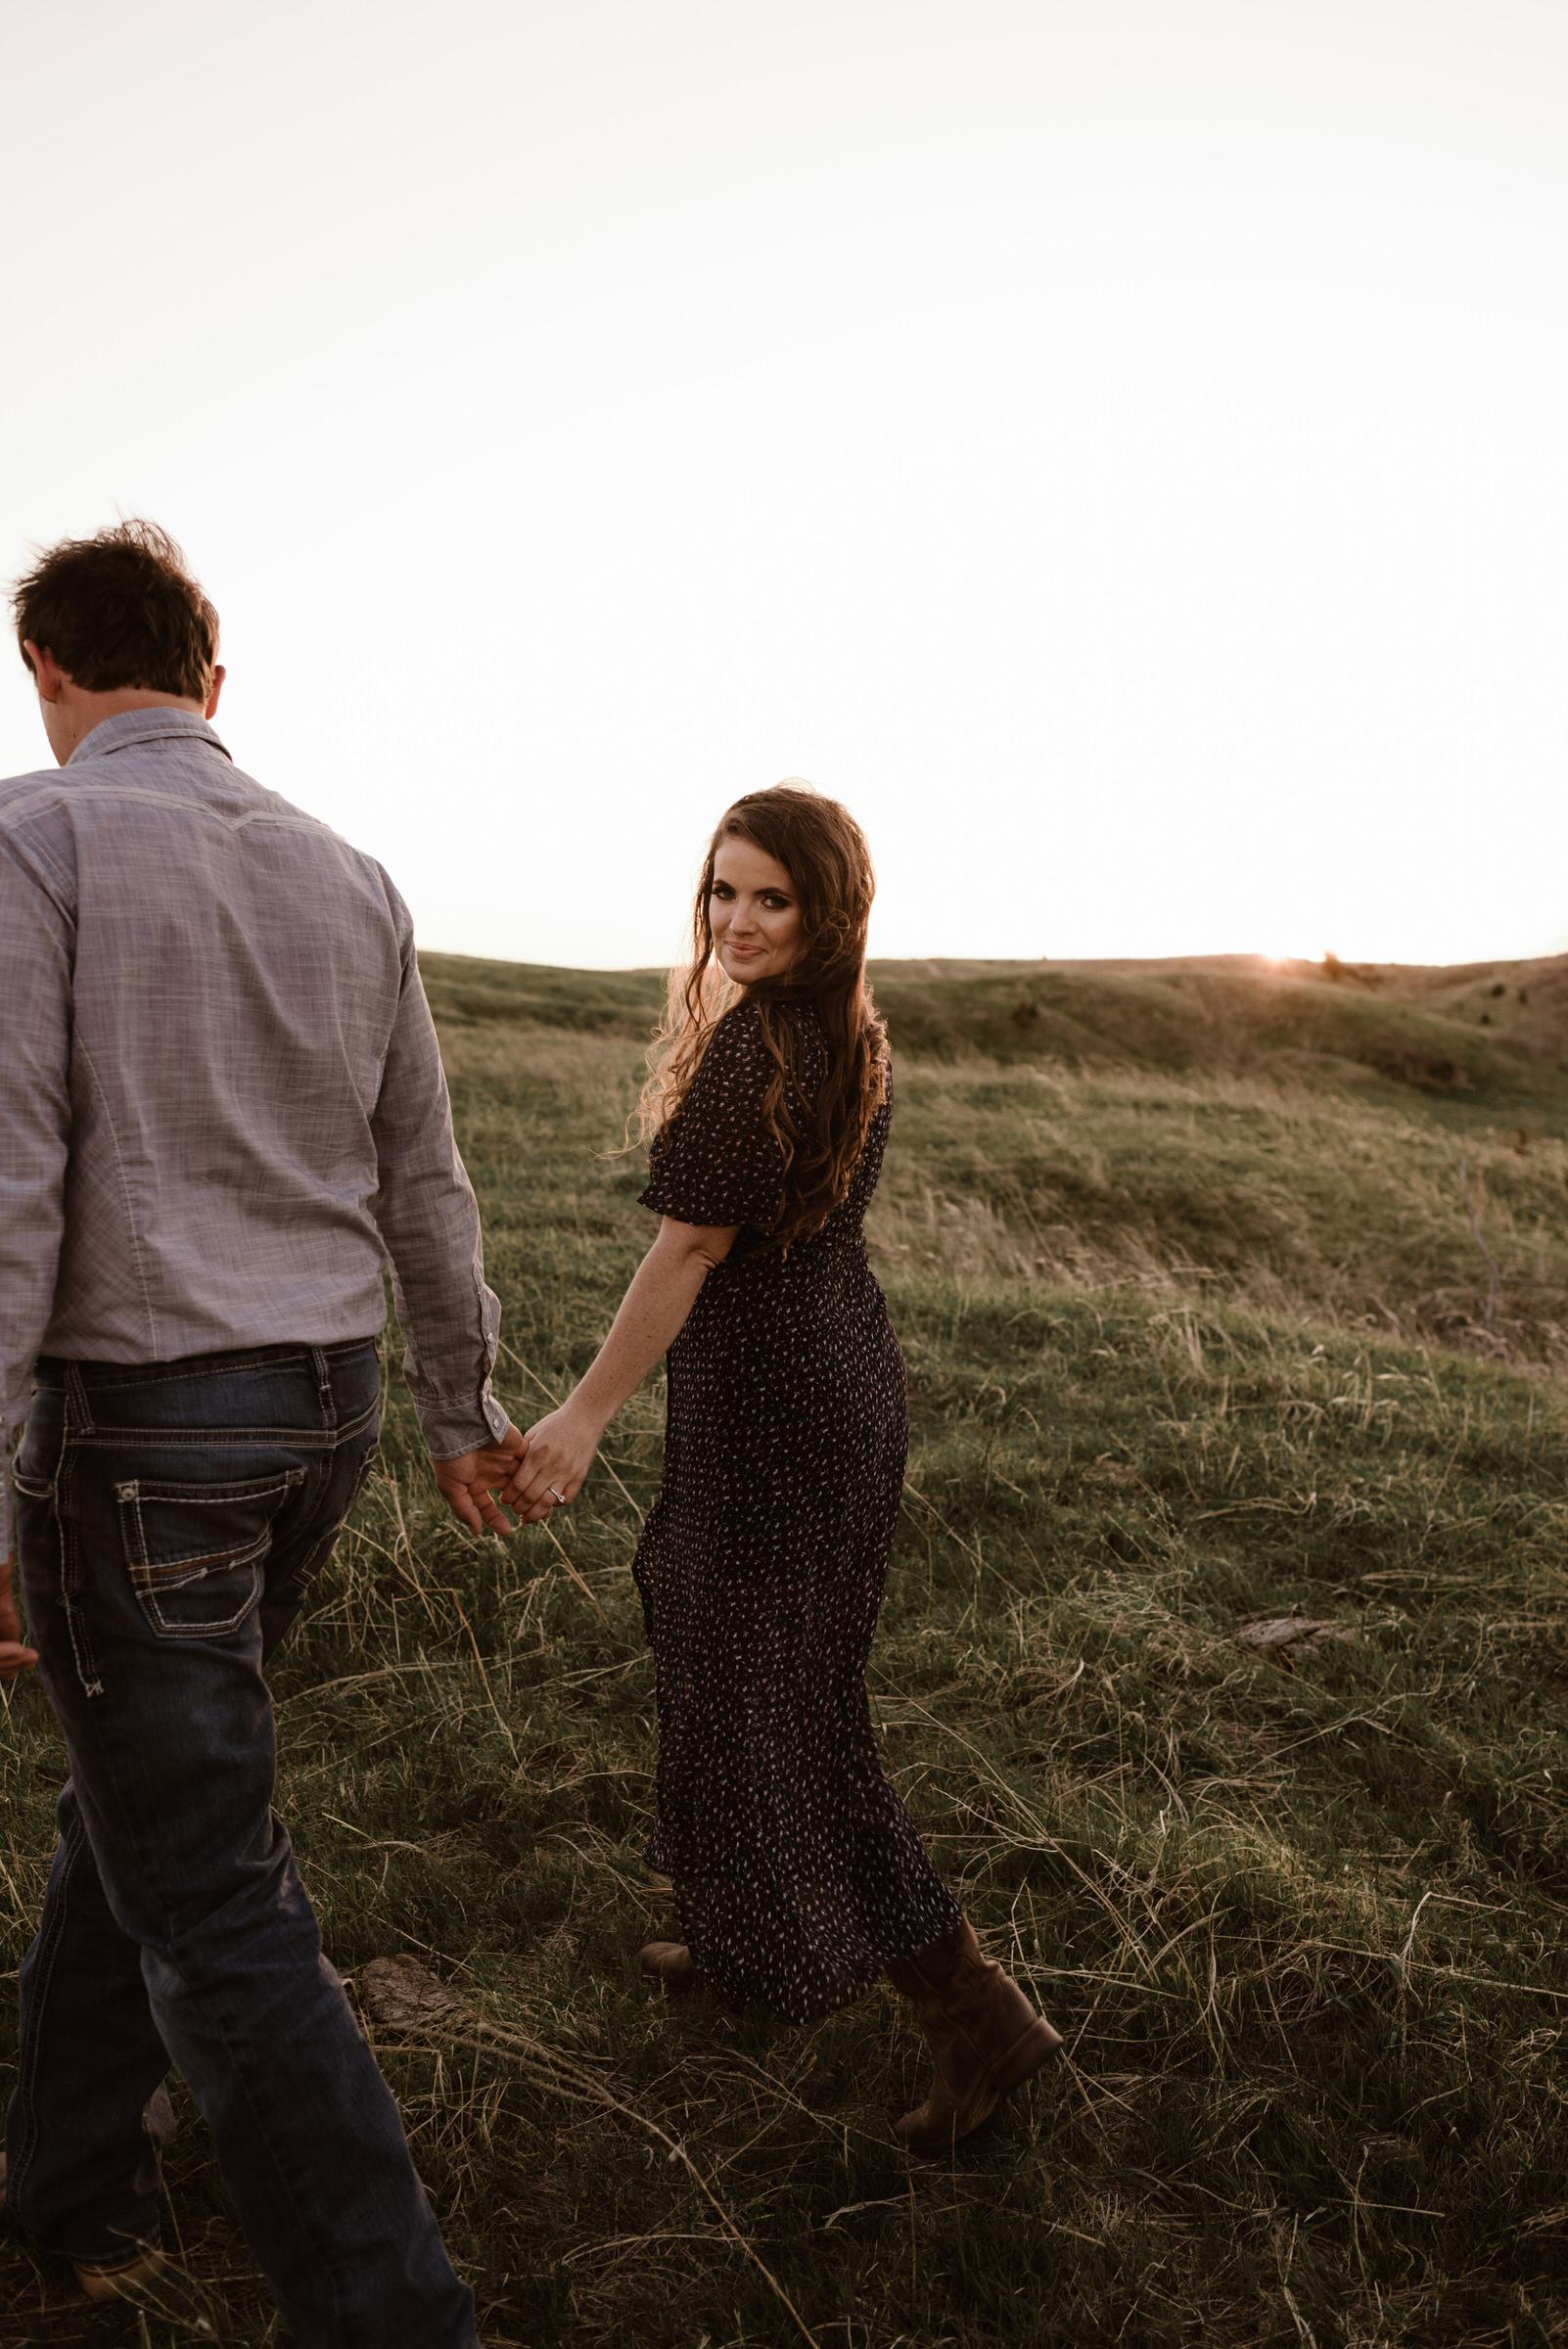 Sandhills-Nebraska-Engagement-Wedding-Photographer-Kaylie-Sirek-Photography-038.jpg